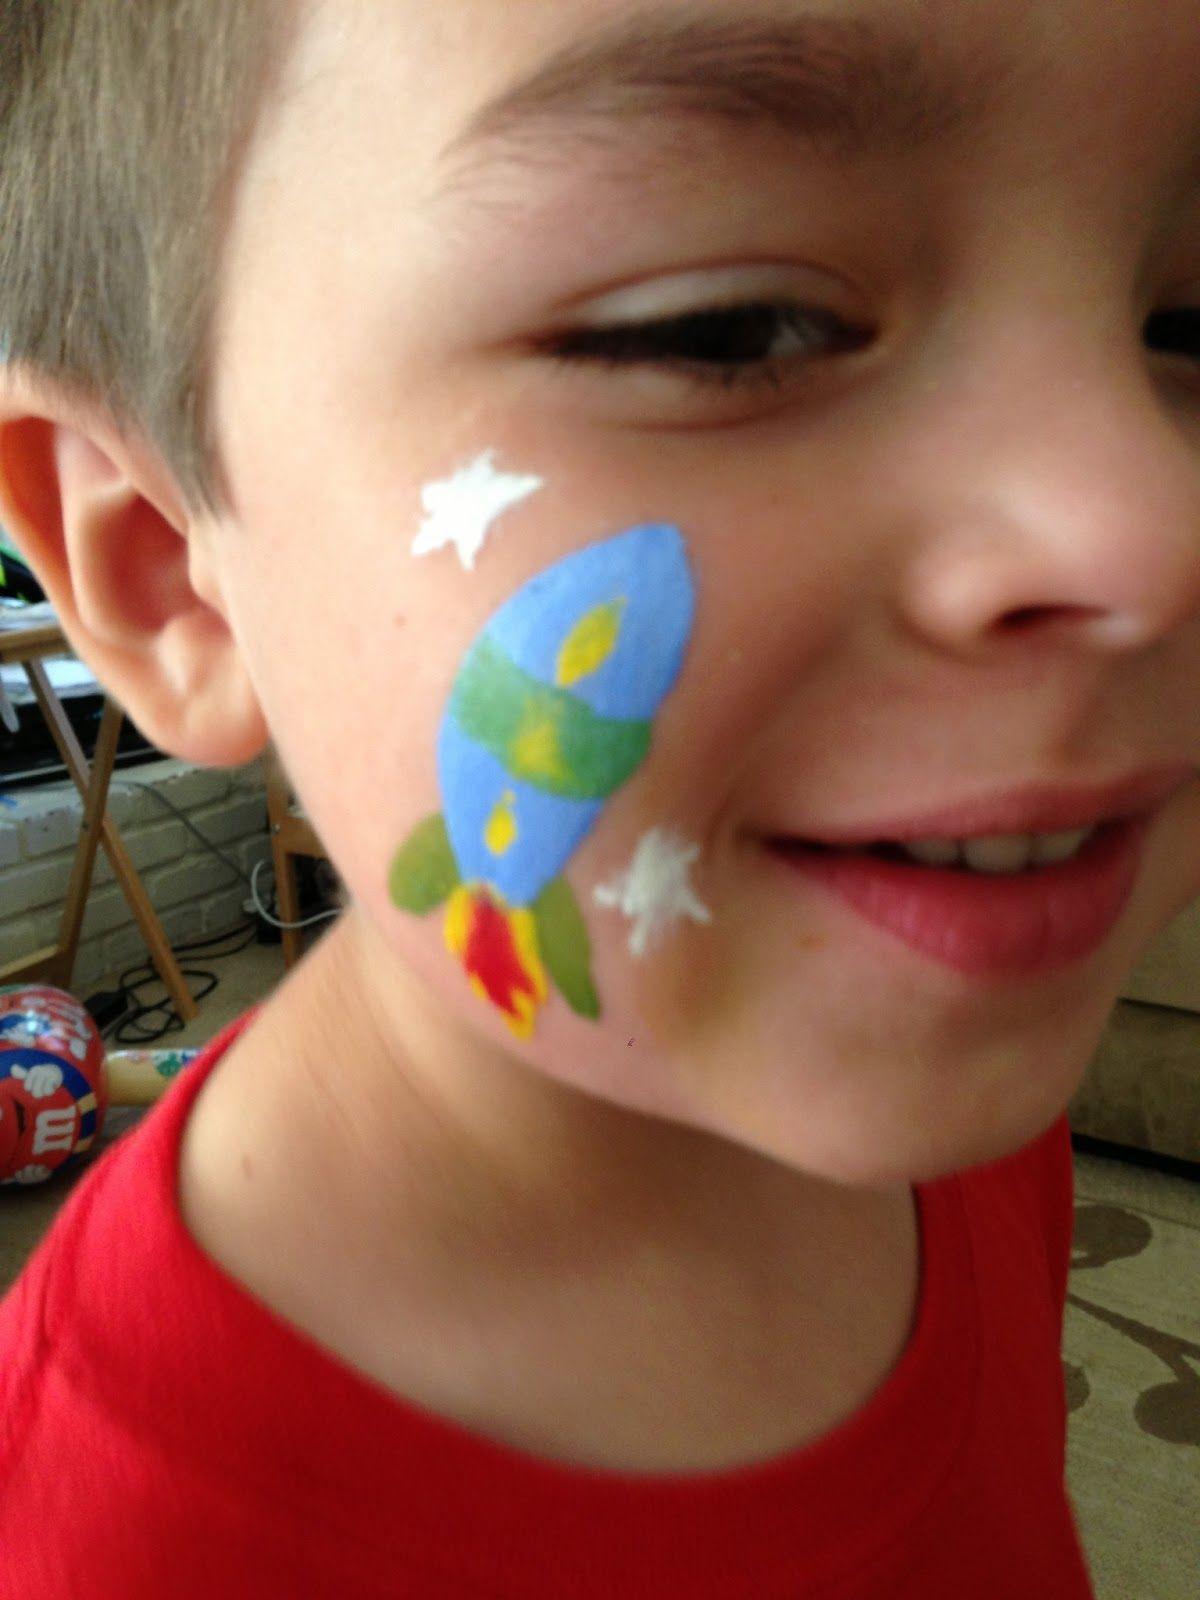 Uncategorized Easy Face Painting For Boys viewing gallery for simple face paint painting easy ideas beginners